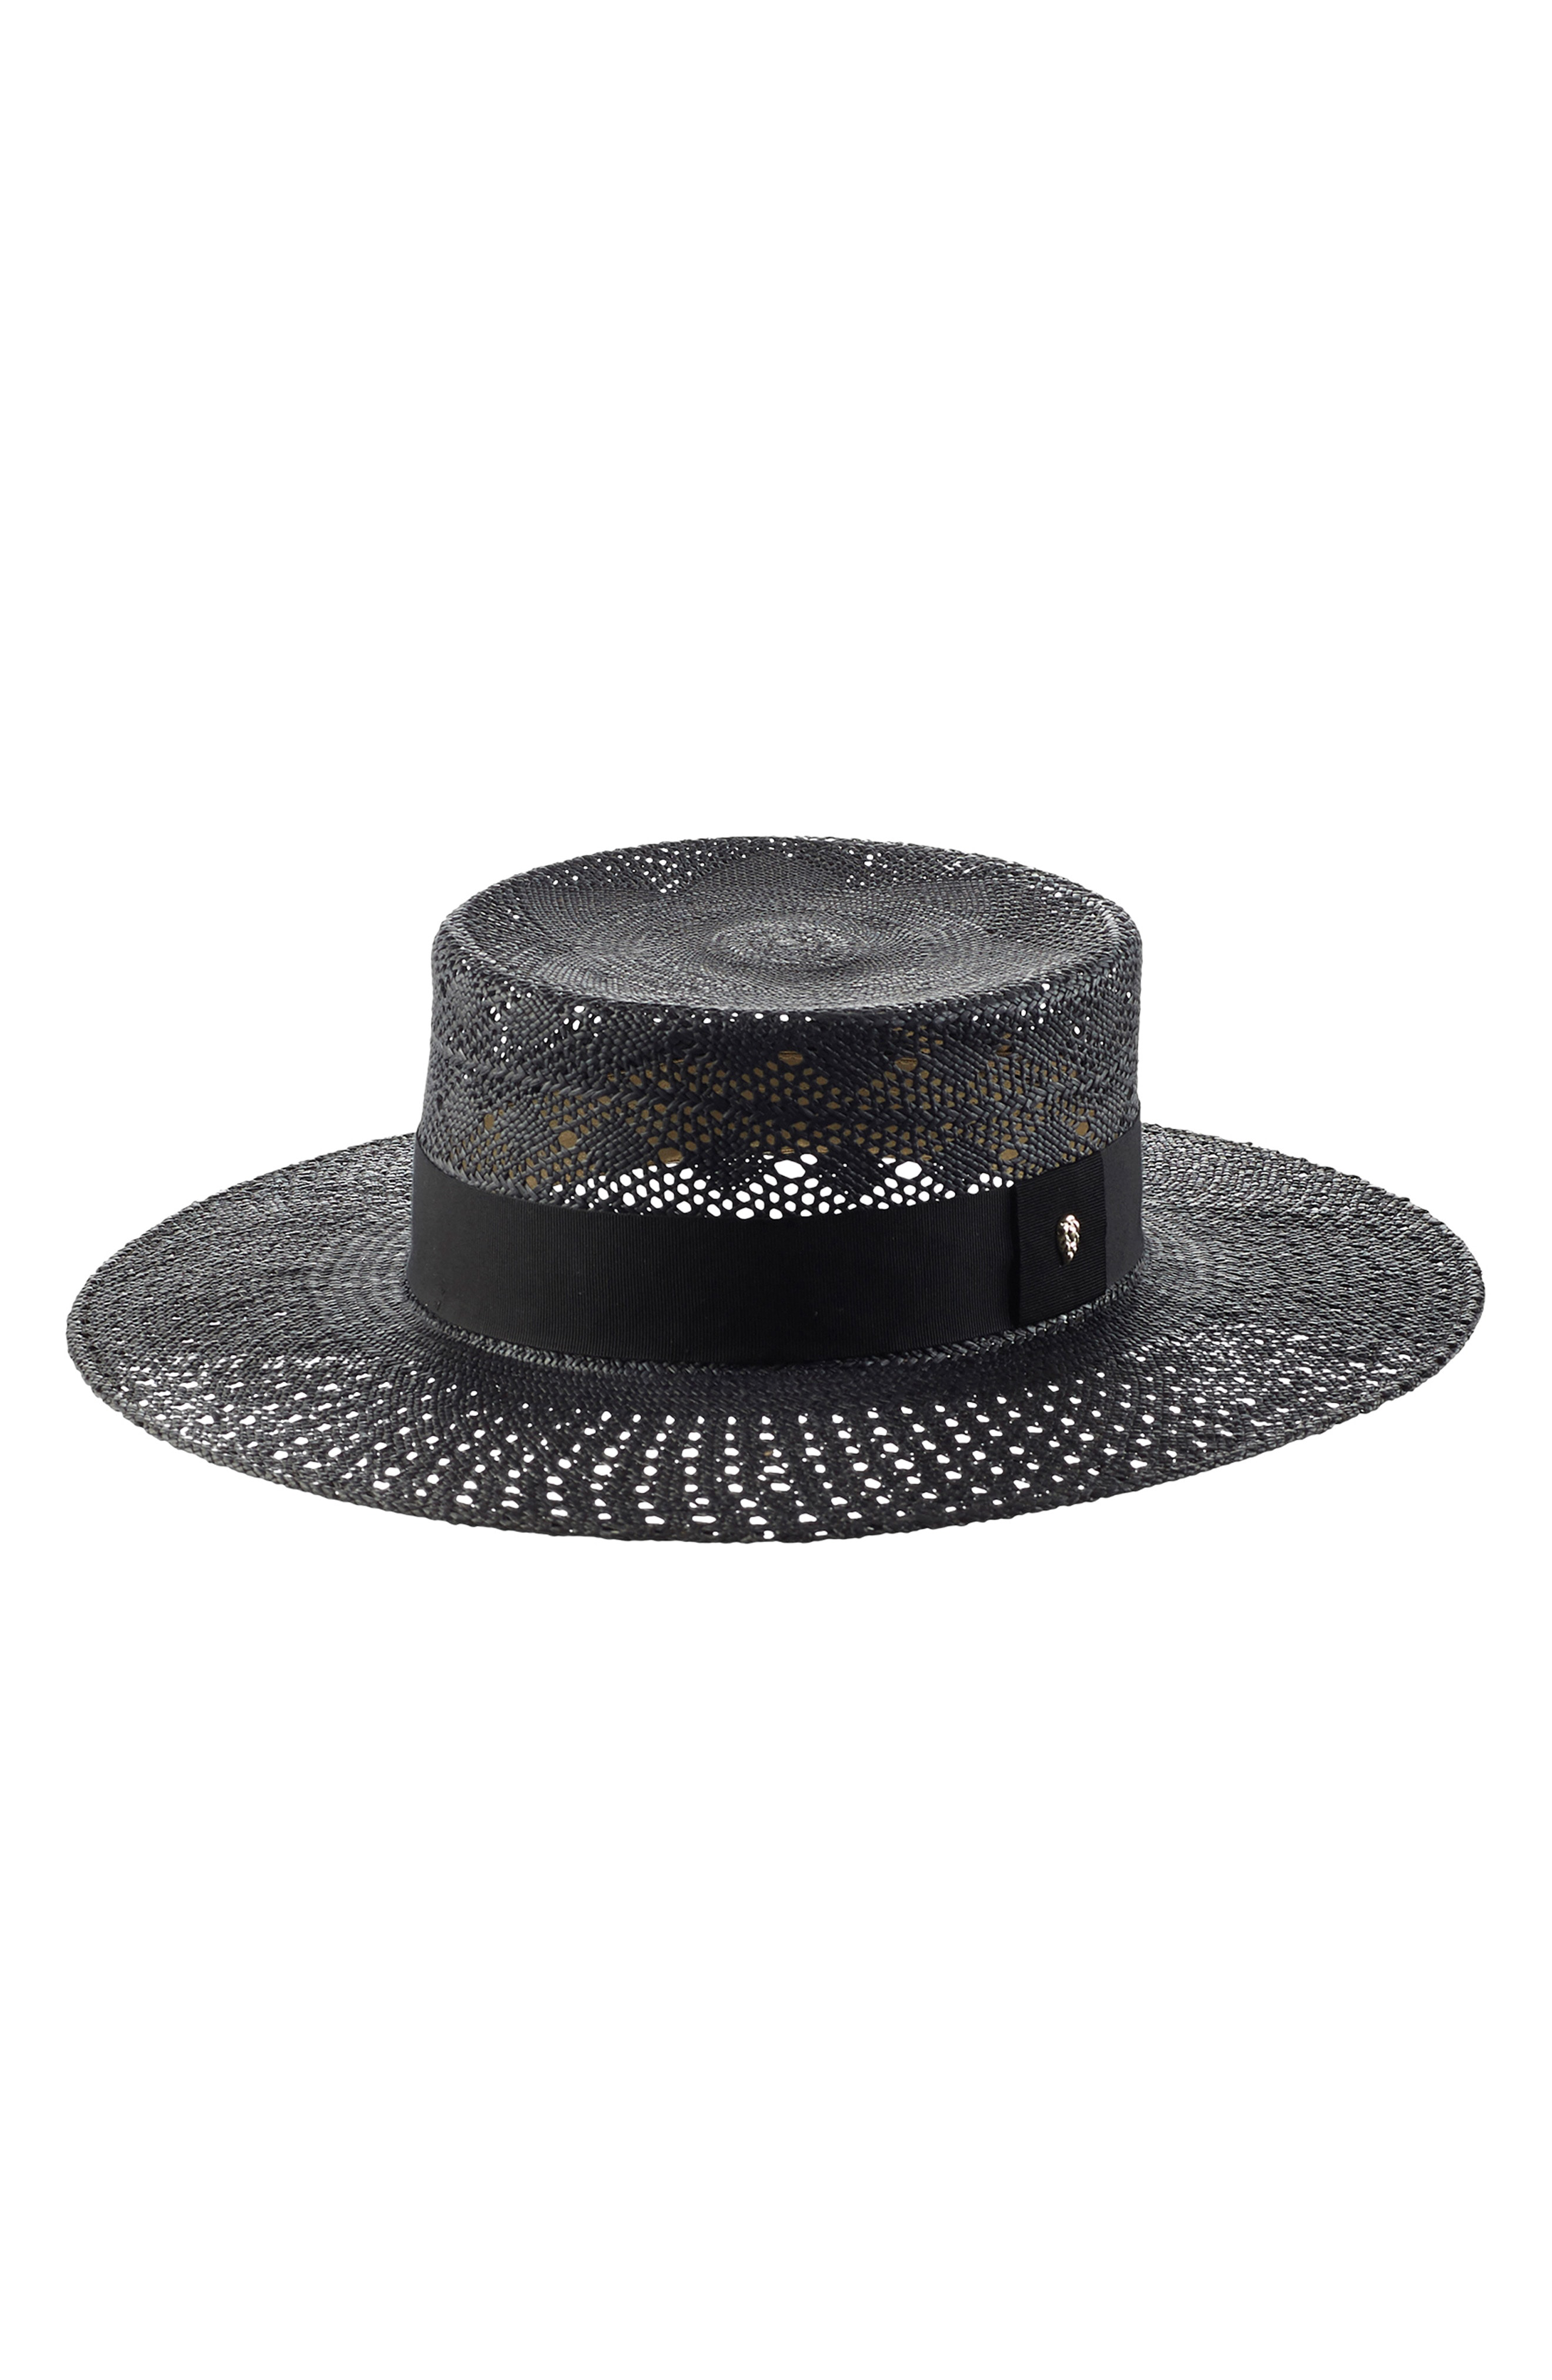 e83d13367616b Helen Kaminski Panama Boater Hat - Black In Black  Black